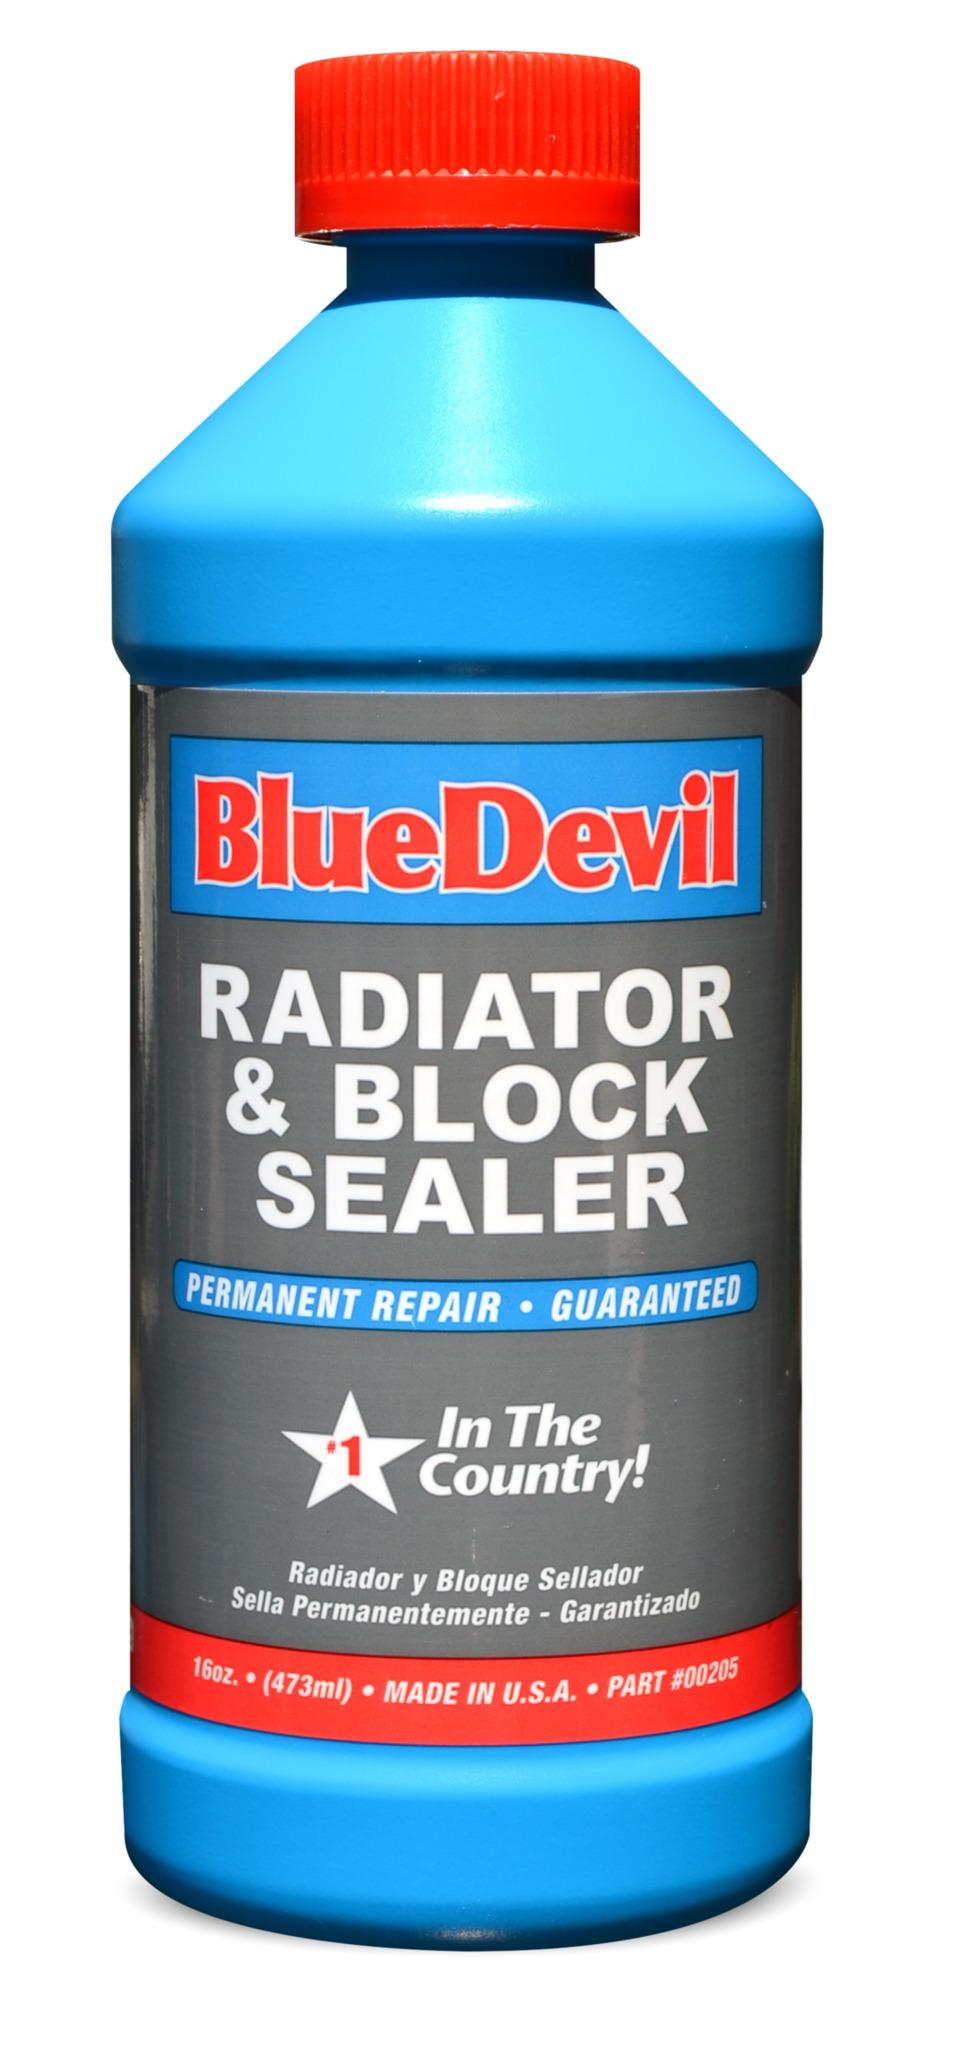 BlueDevil Products Radiator & Block Sealer in Sealants